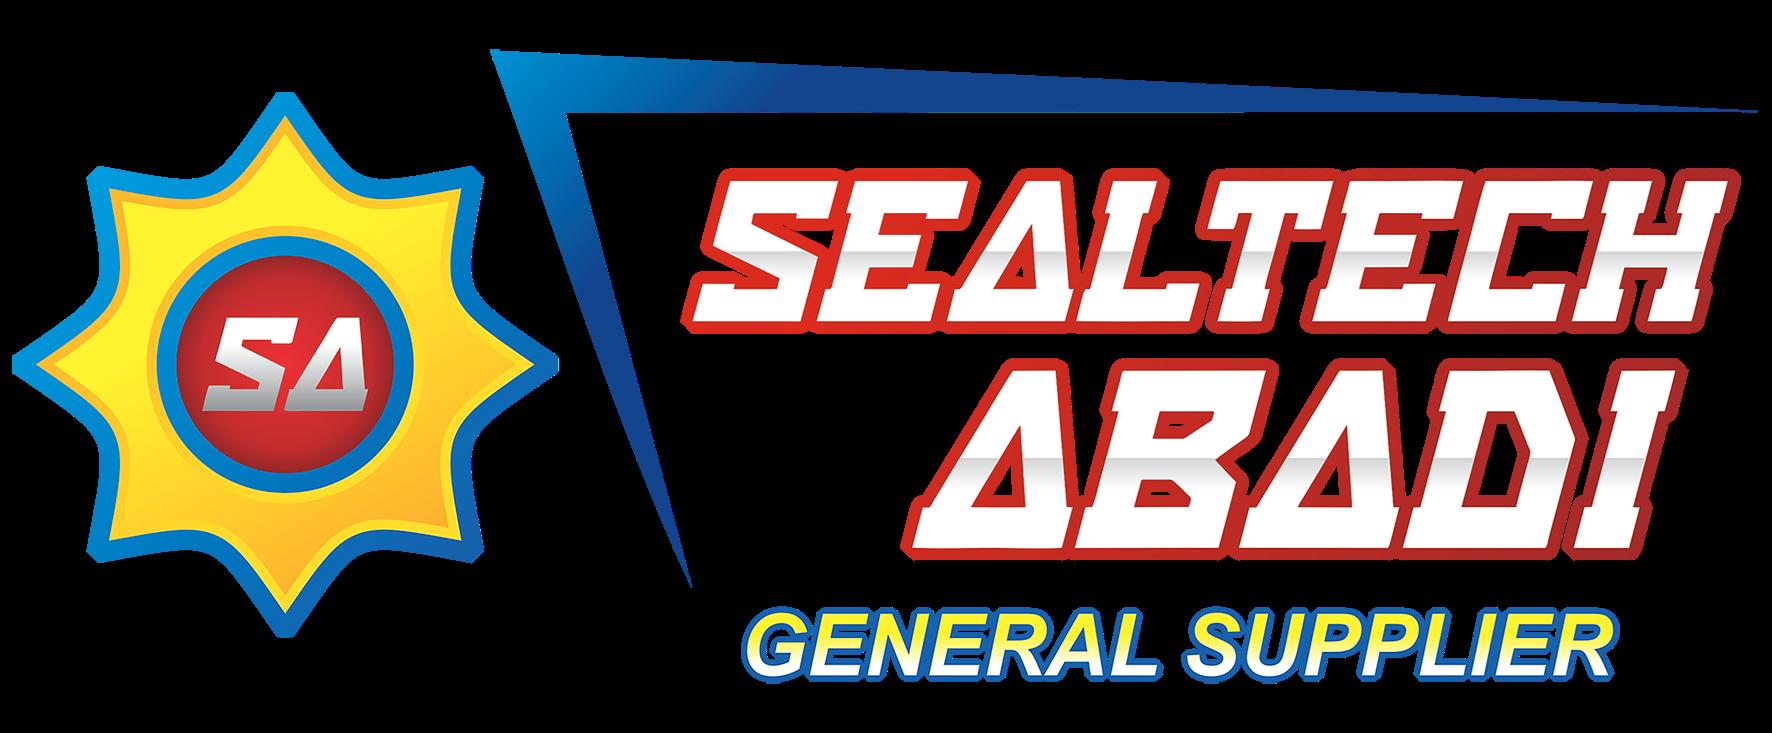 Sealtech Abadi